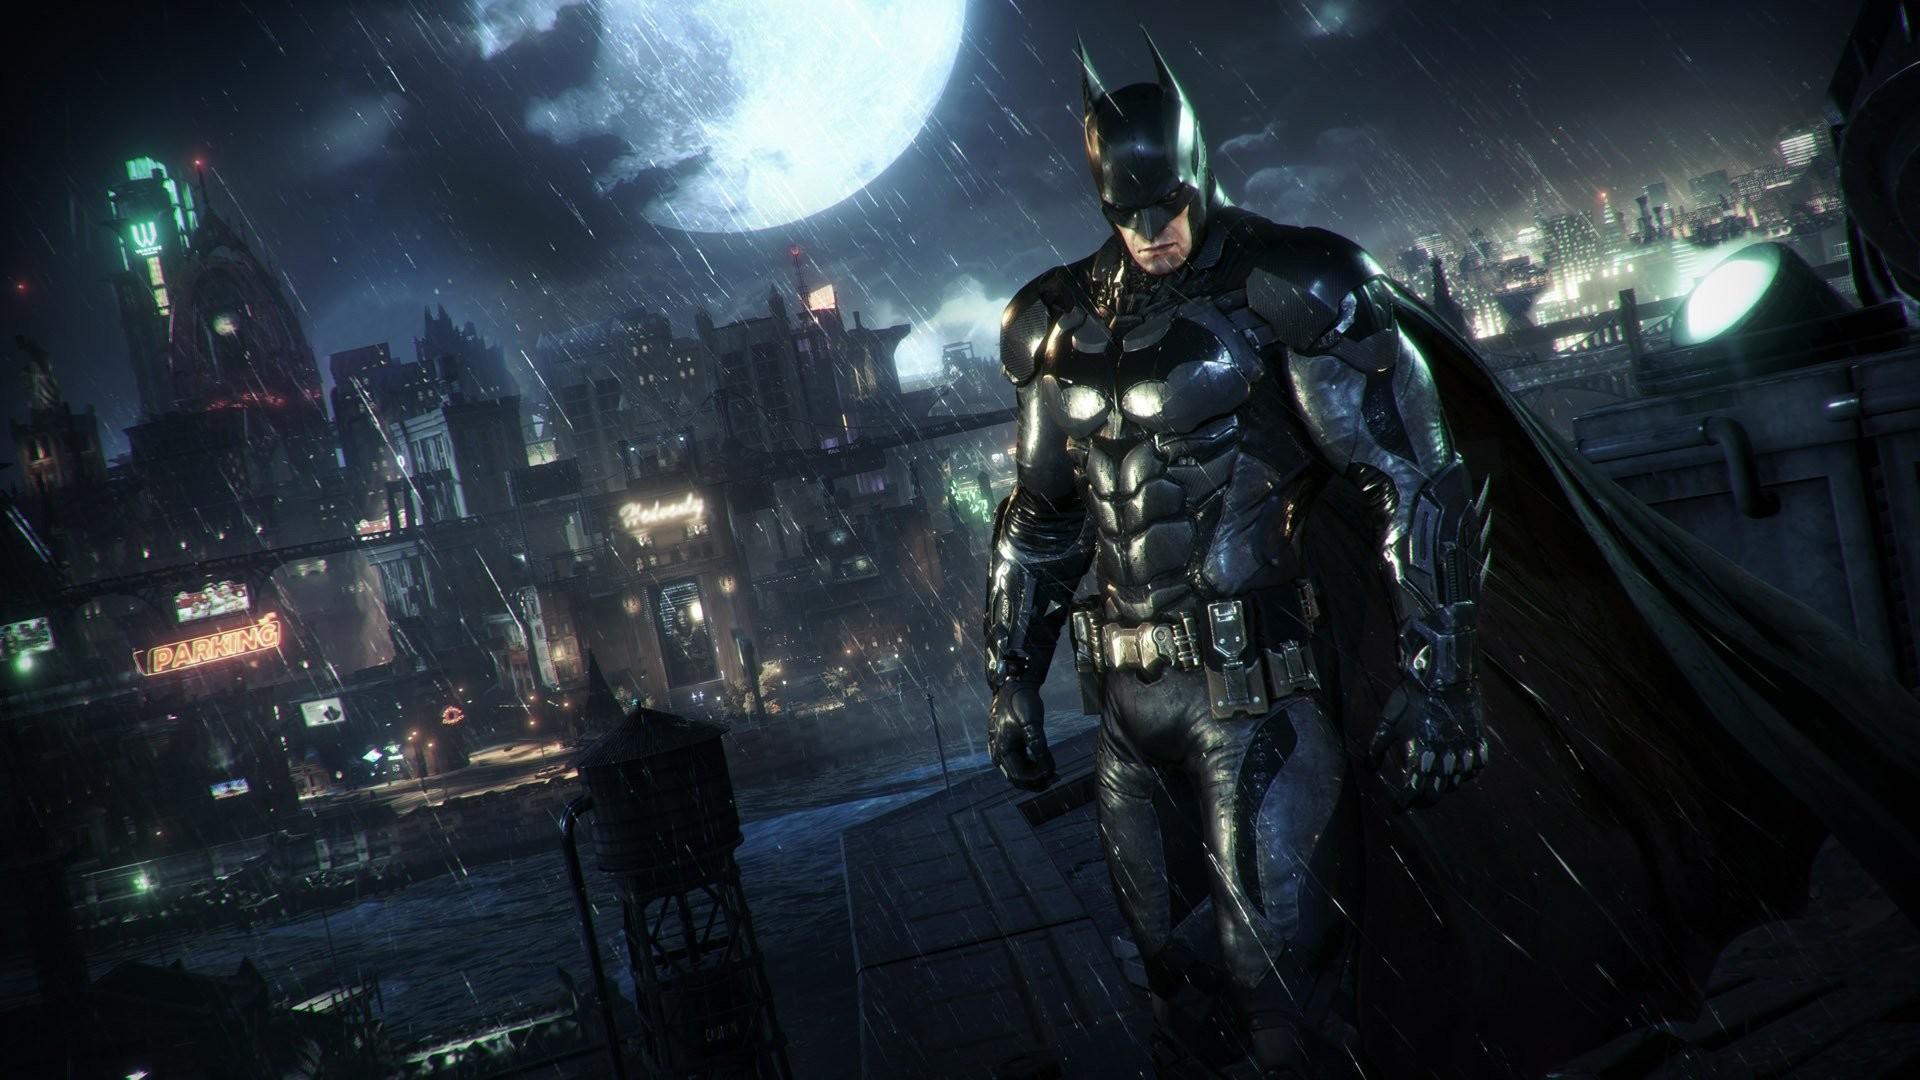 Batman: Arkham Knight (Available Now)